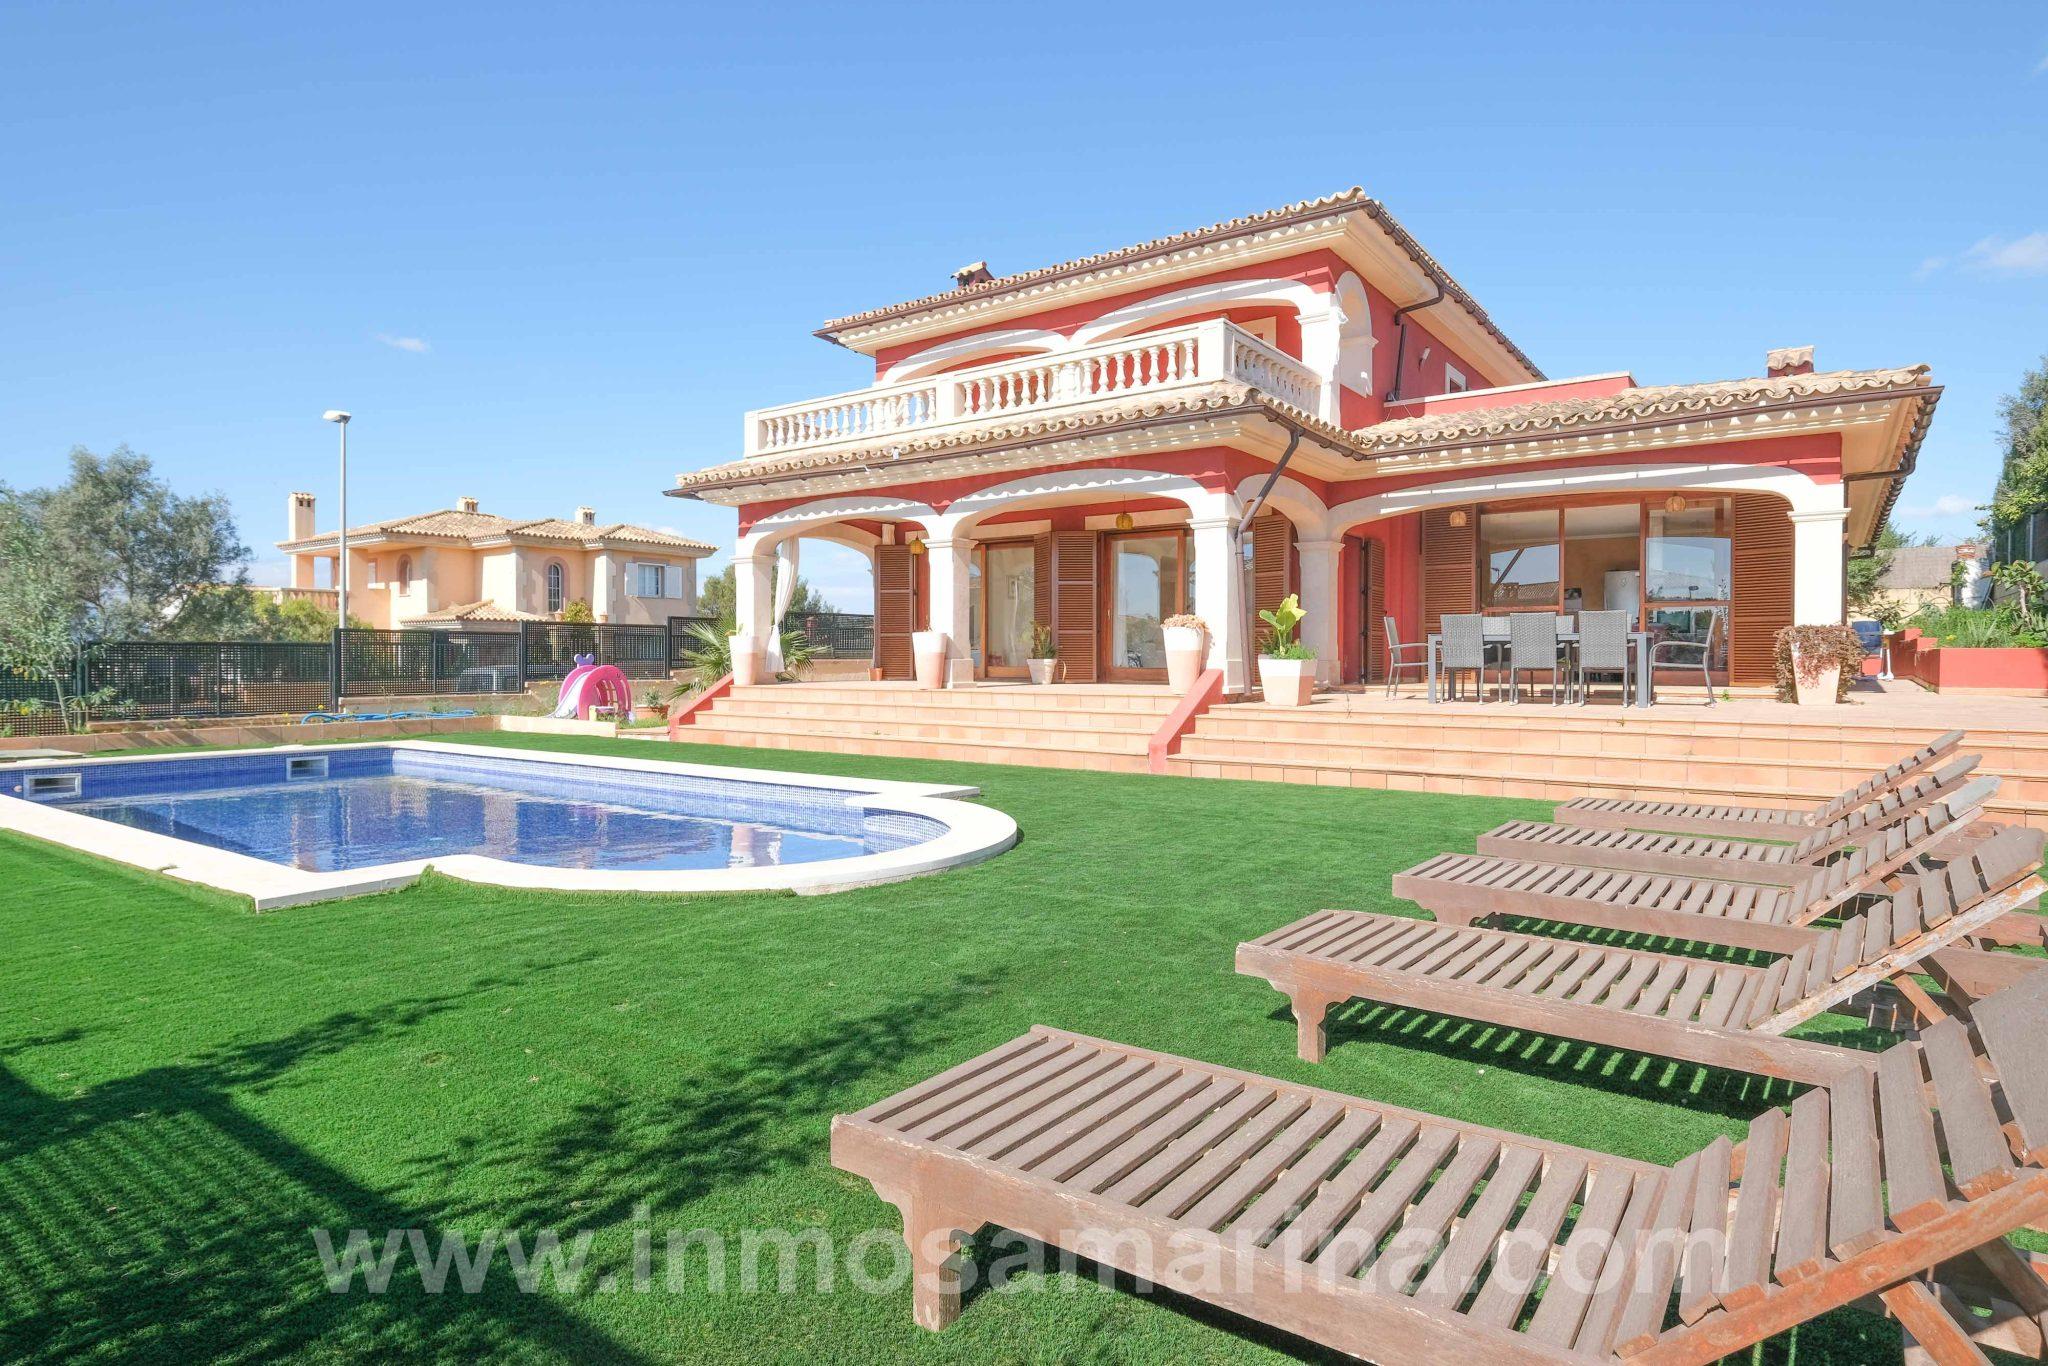 Este espectacular chalet con piscina se encuentra ubicado en Marratxi. Venta